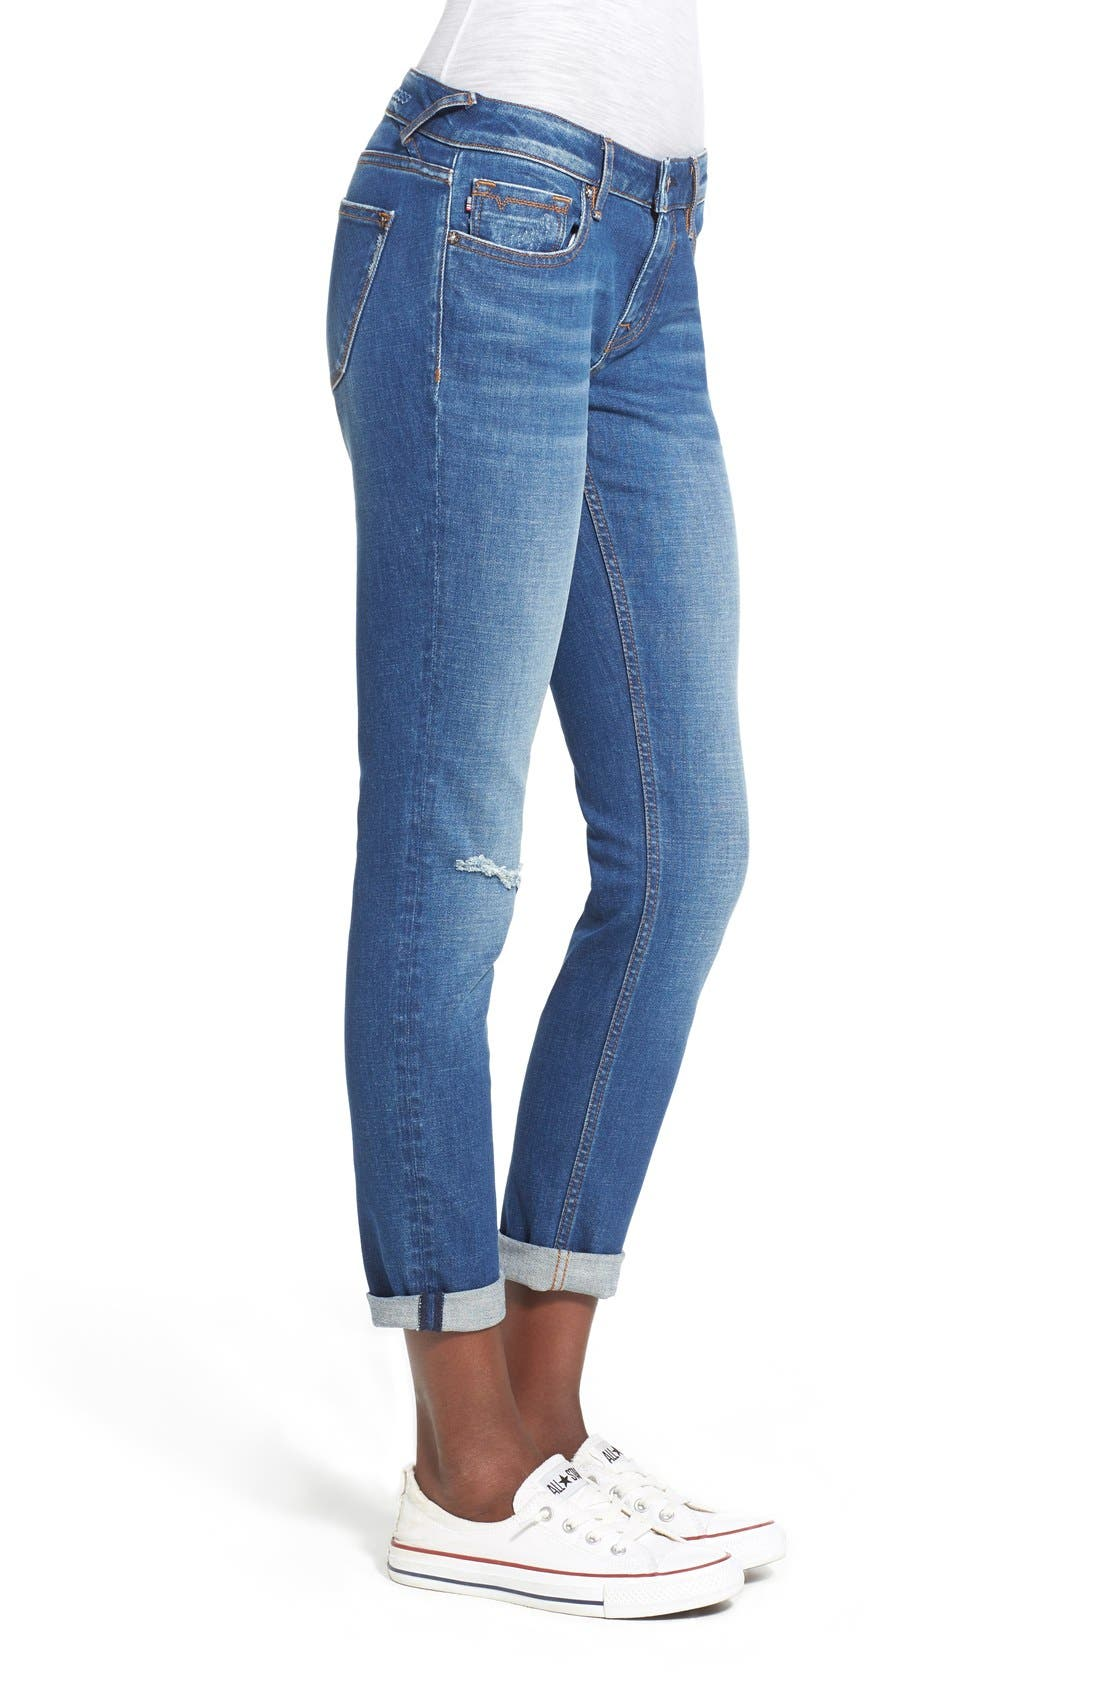 Alternate Image 3  - Vigoss 'Tomboy Thompson' Destructed Jeans (Medium Wash)